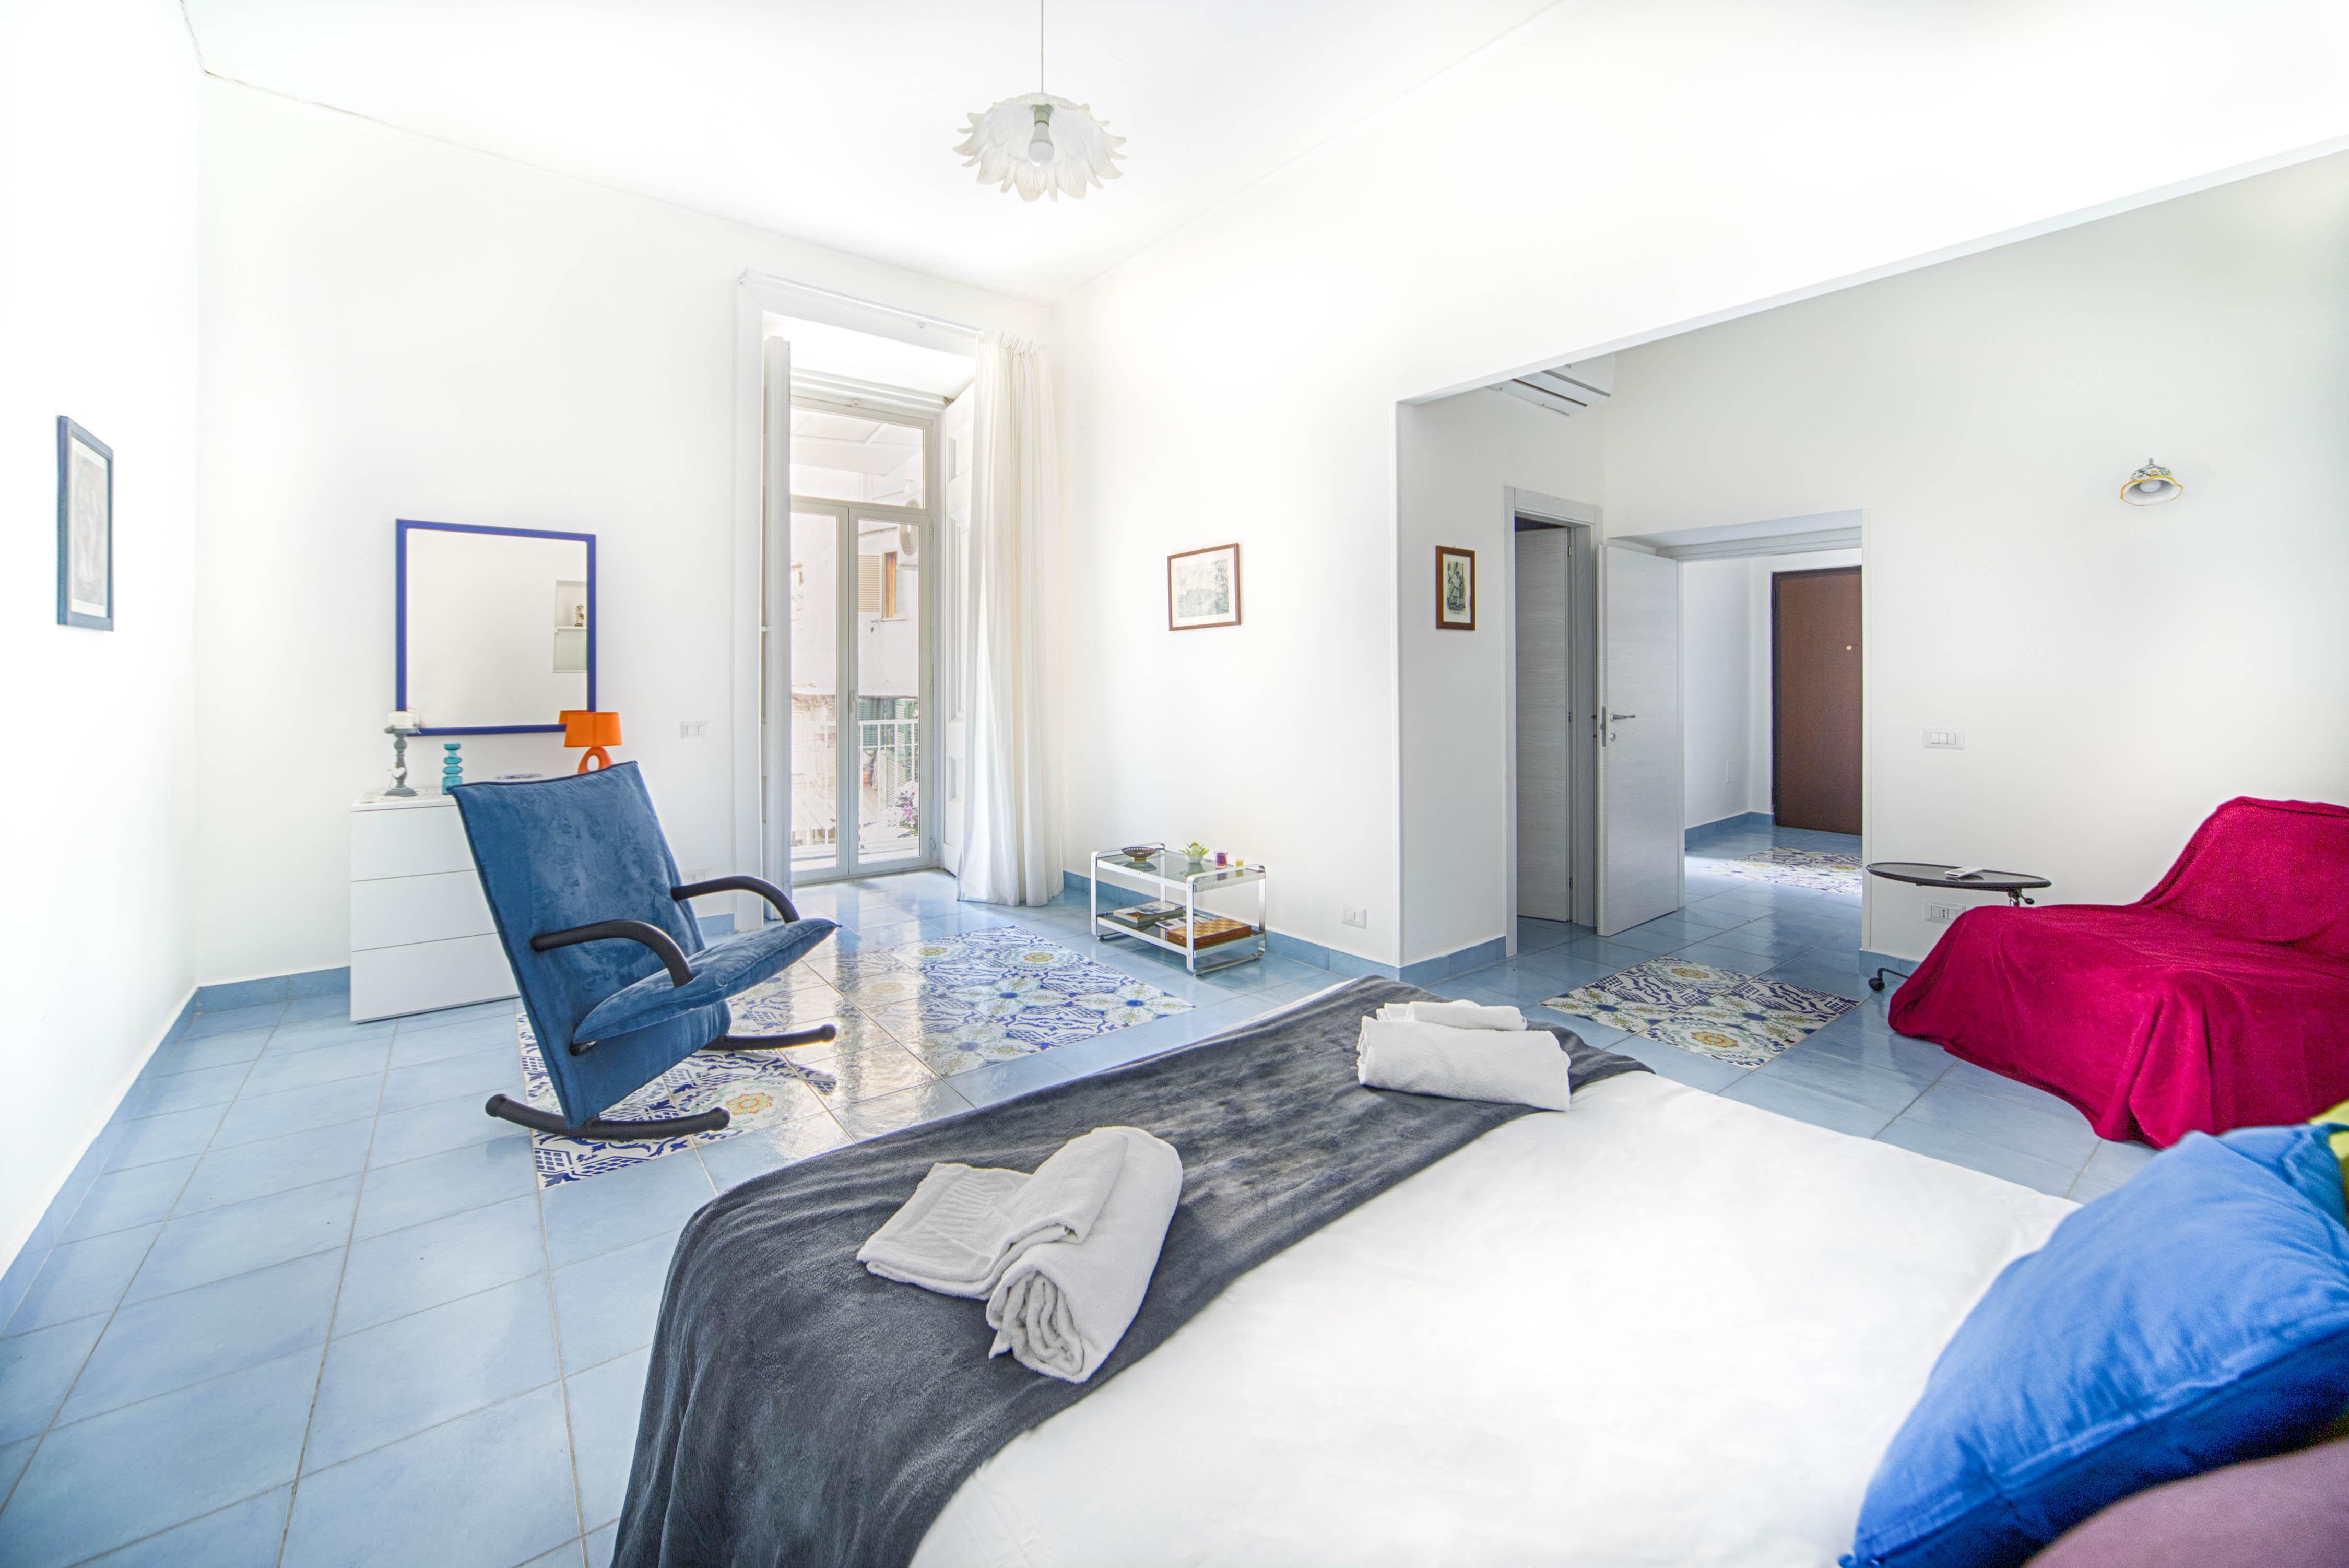 Apartment Il Limoncello - Historical Center of Naples photo 18807011